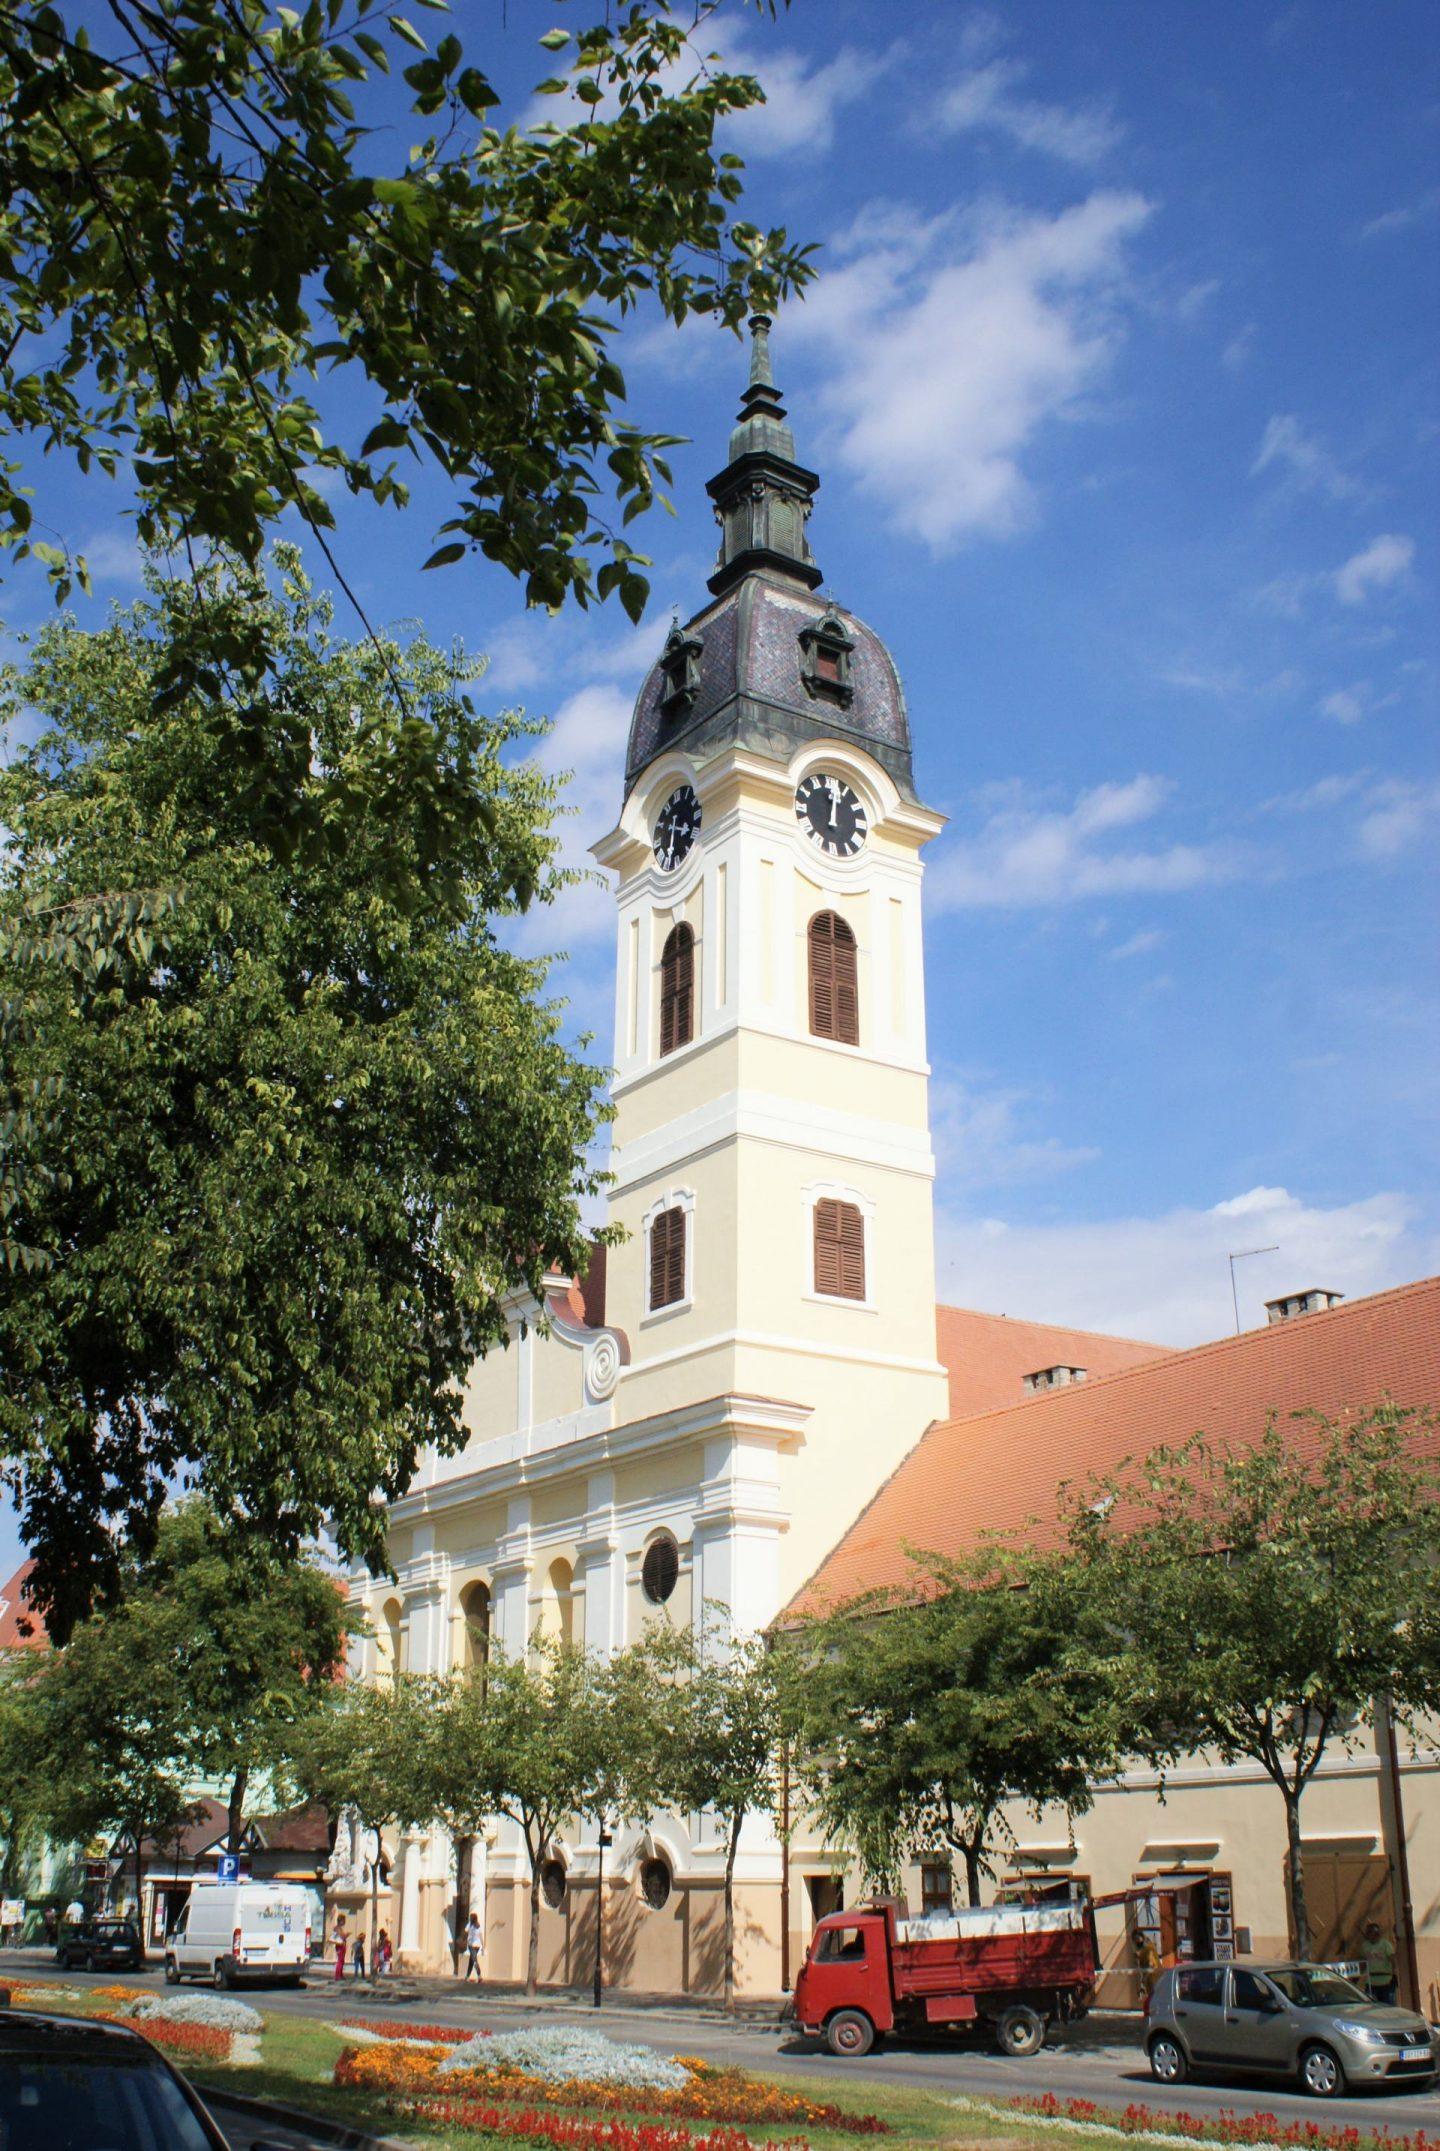 Crkva Presvetog Trojstva © According to Kristina